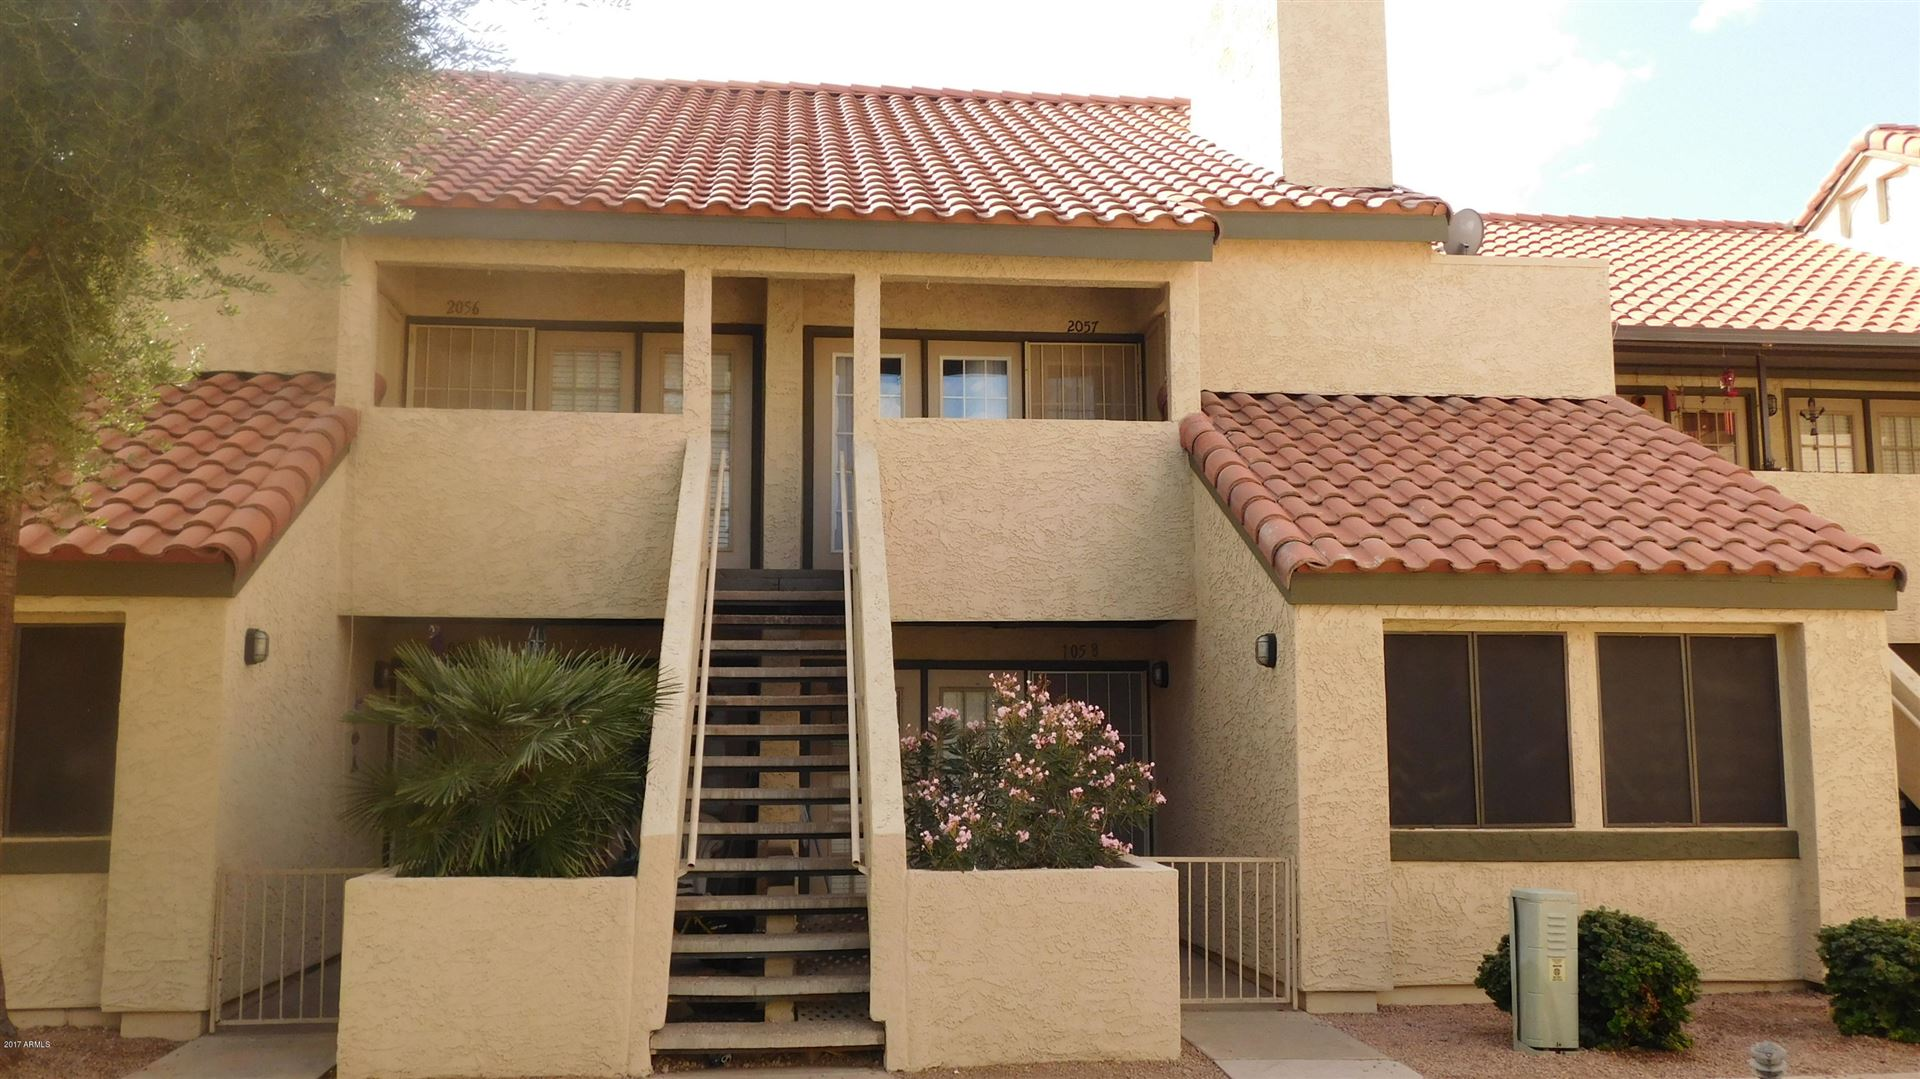 30 E BROWN Road #2057, Mesa, AZ 85201 - MLS#: 6113329